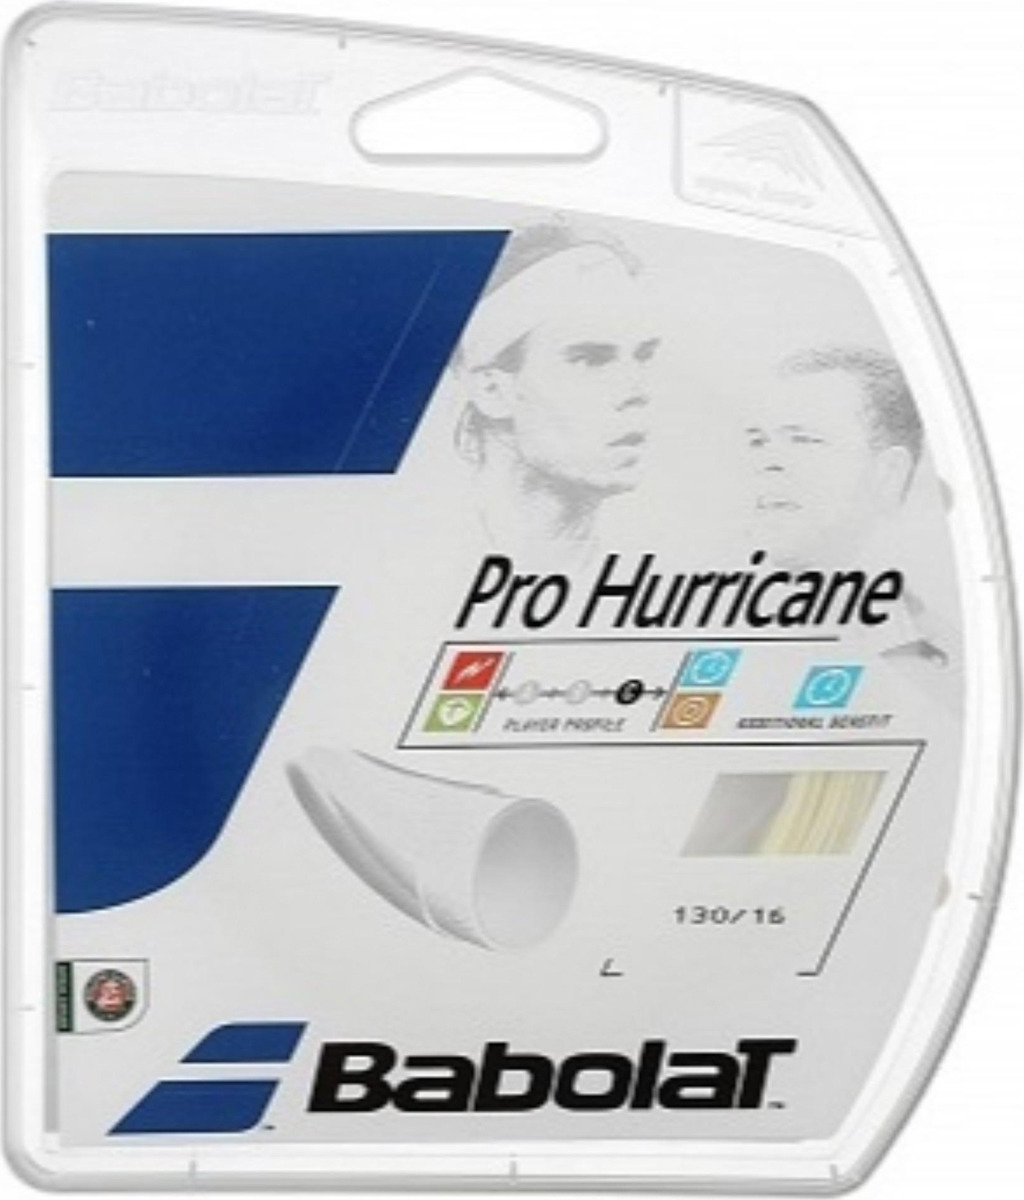 Теннисная струна Babolat Pro Hurricane 125/17, 12 м